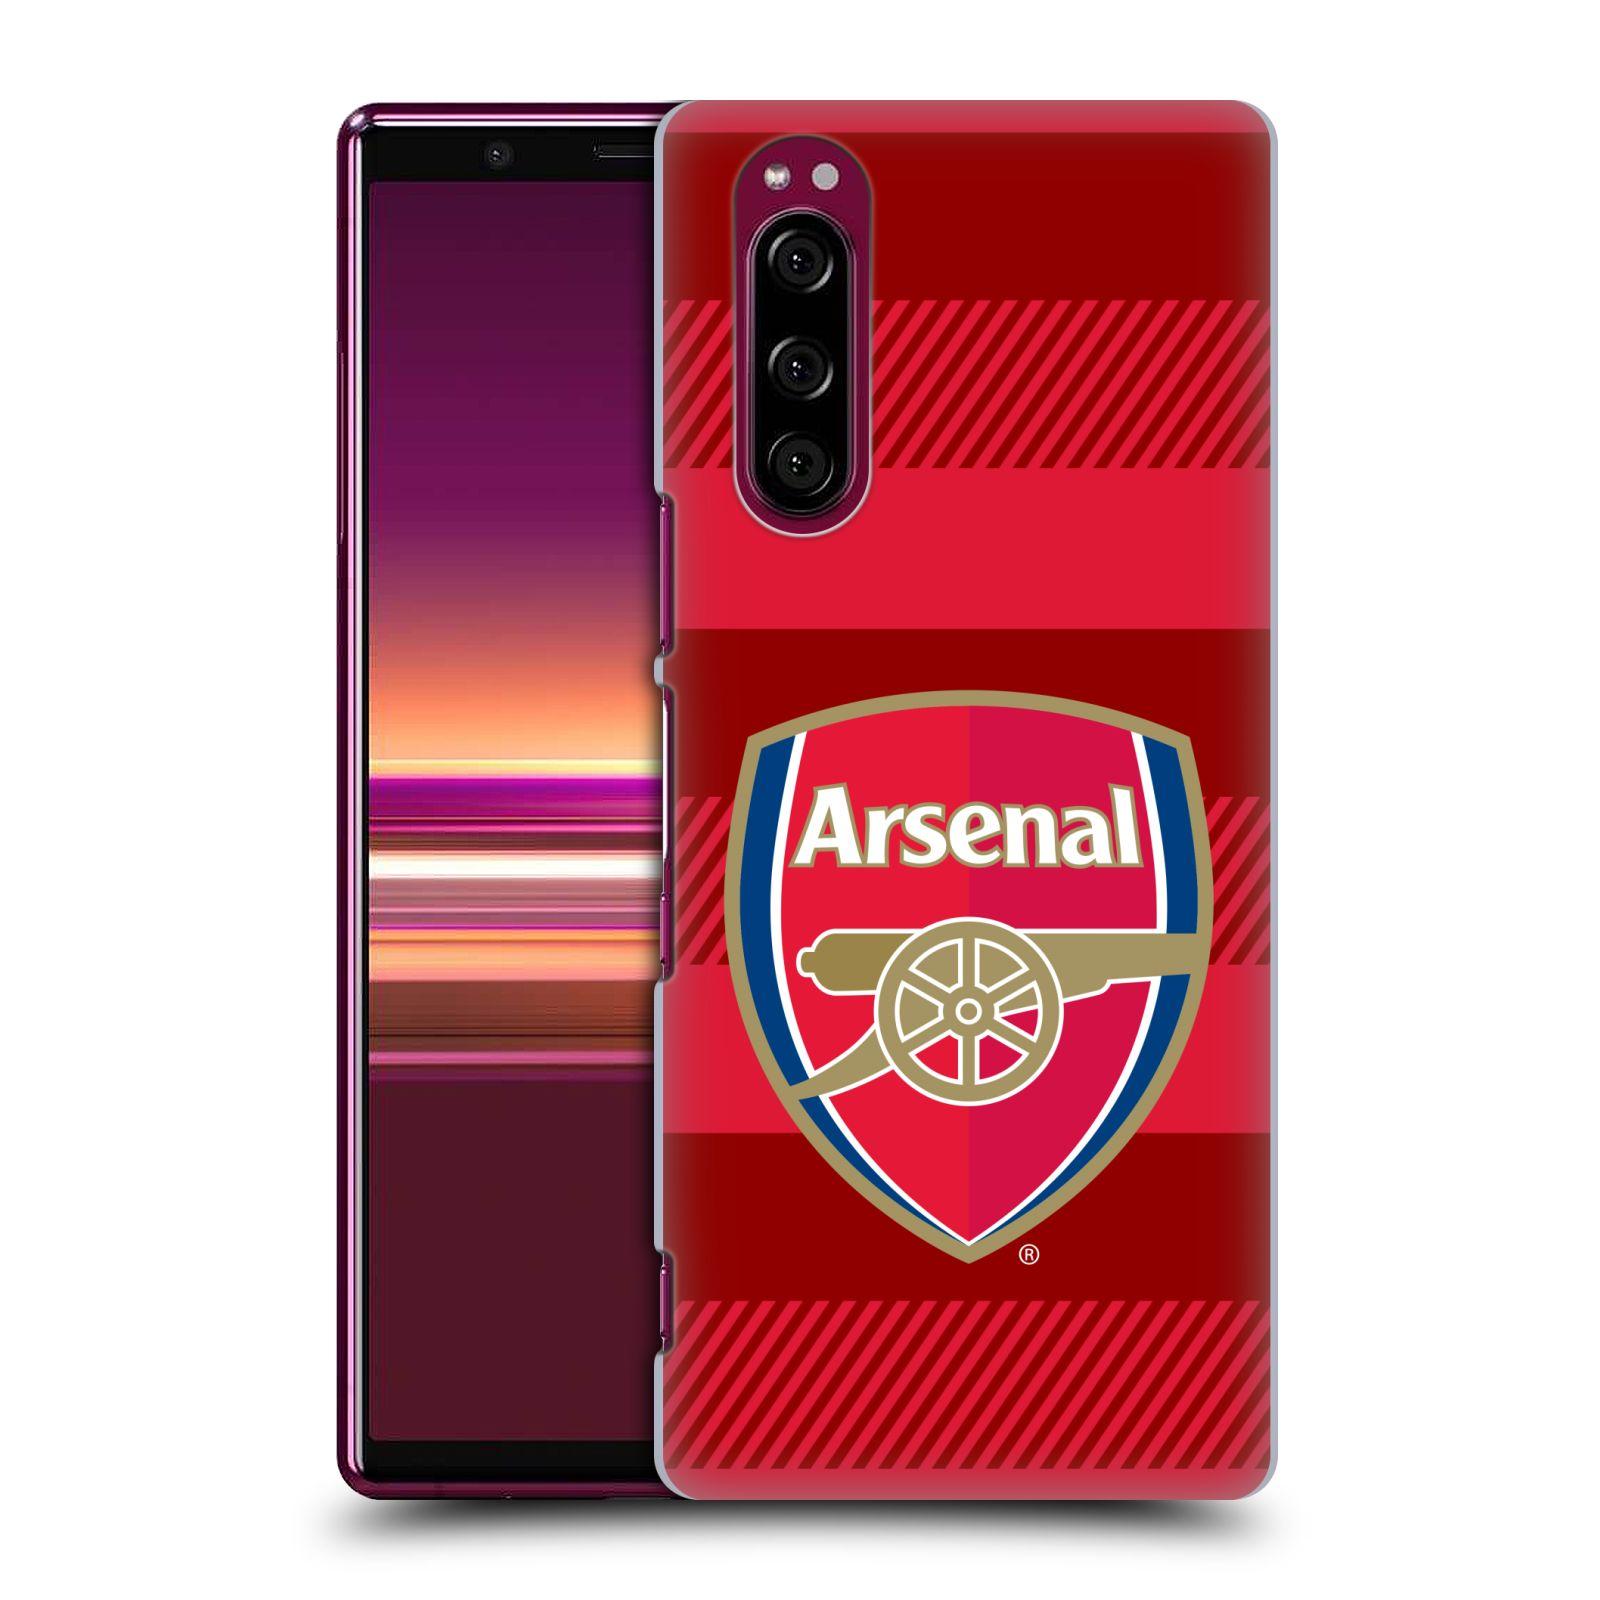 Plastové pouzdro na mobil Sony Xperia 5 - Head Case - Arsenal FC - Logo s pruhy